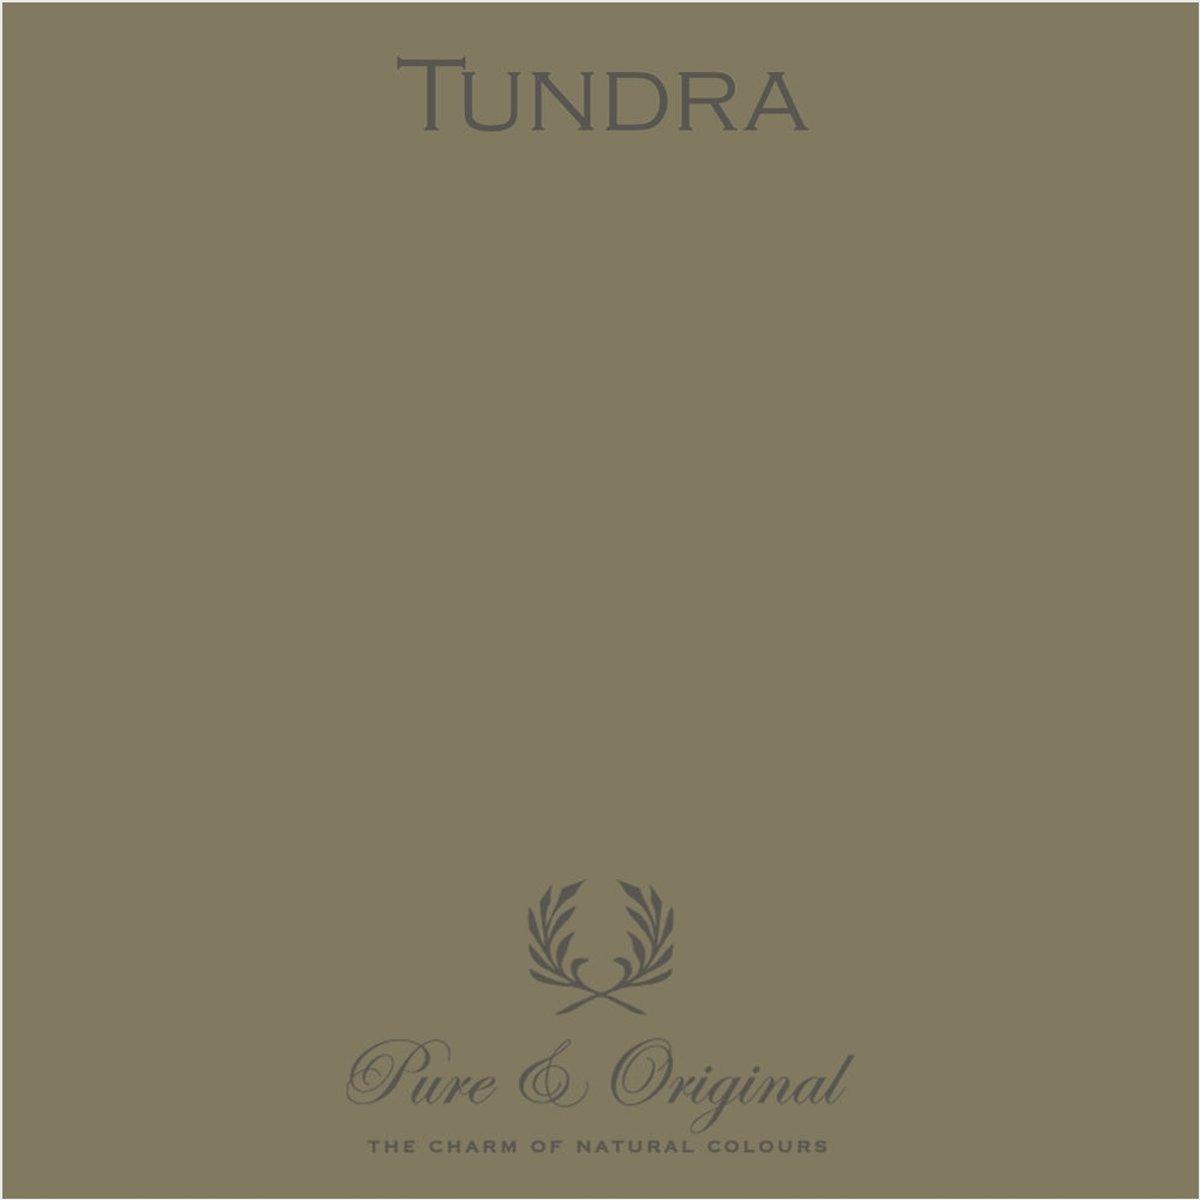 Pure & Original Classico Regular Tundra 2.5 L